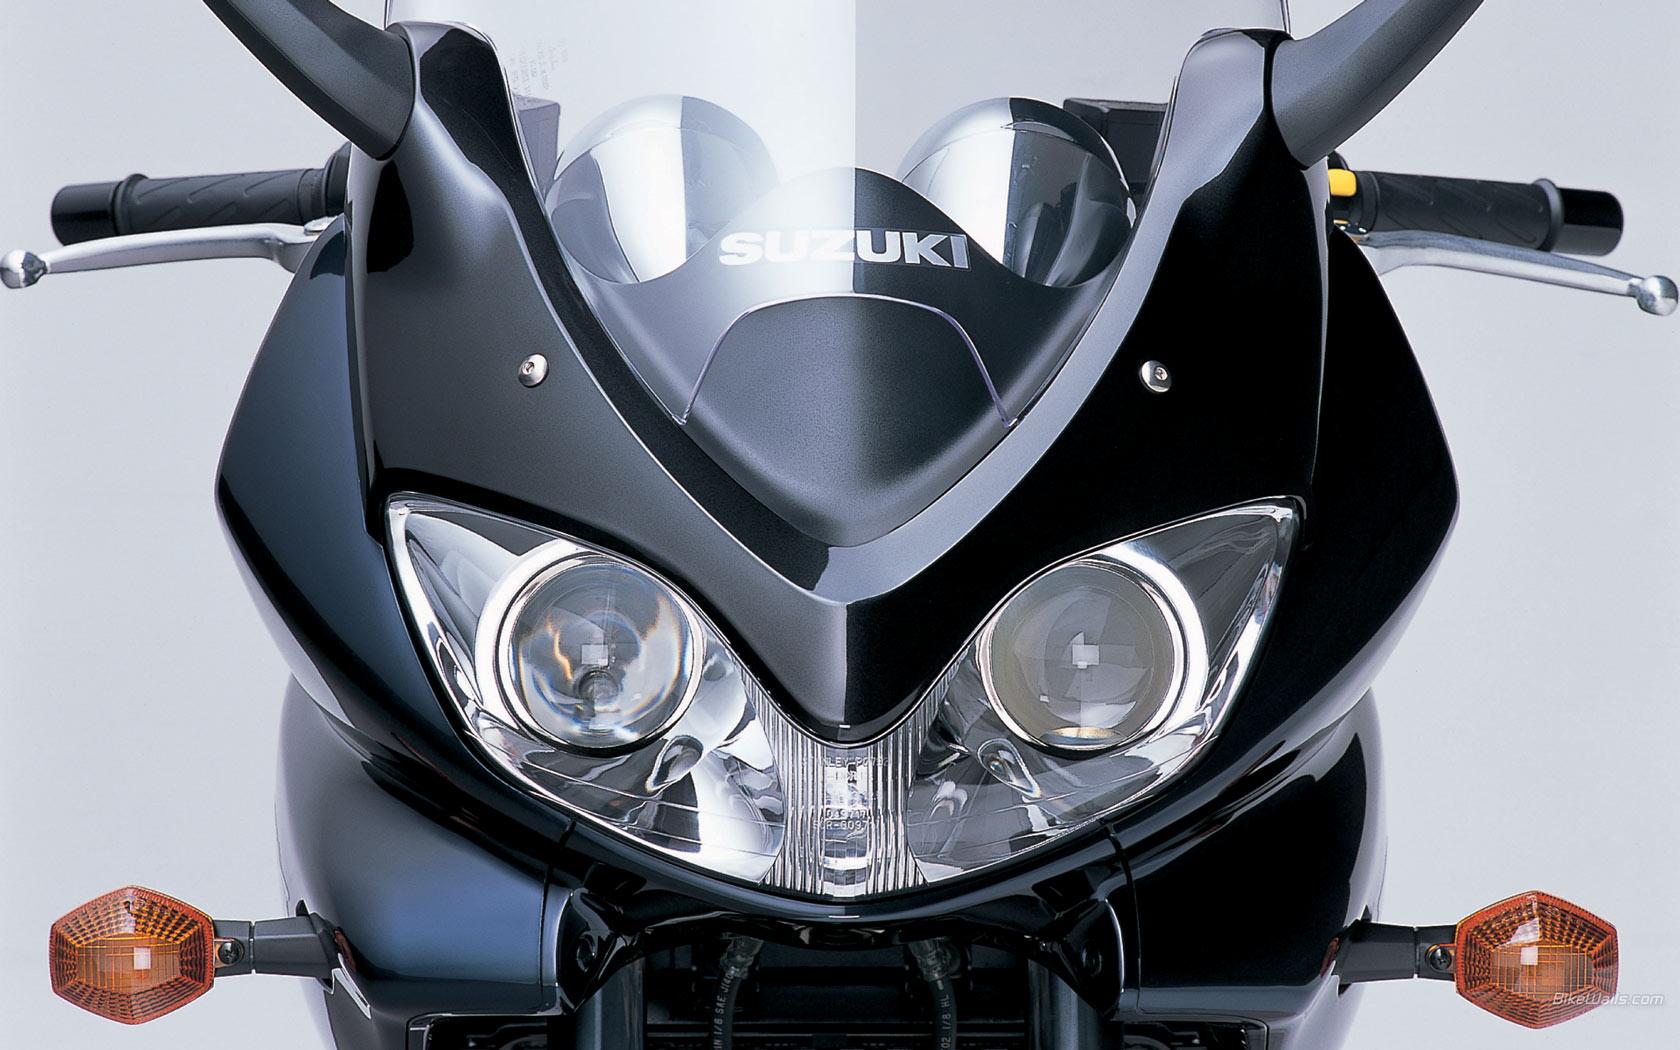 Suzuki Bandit 1200S LAMPA PRZÓD